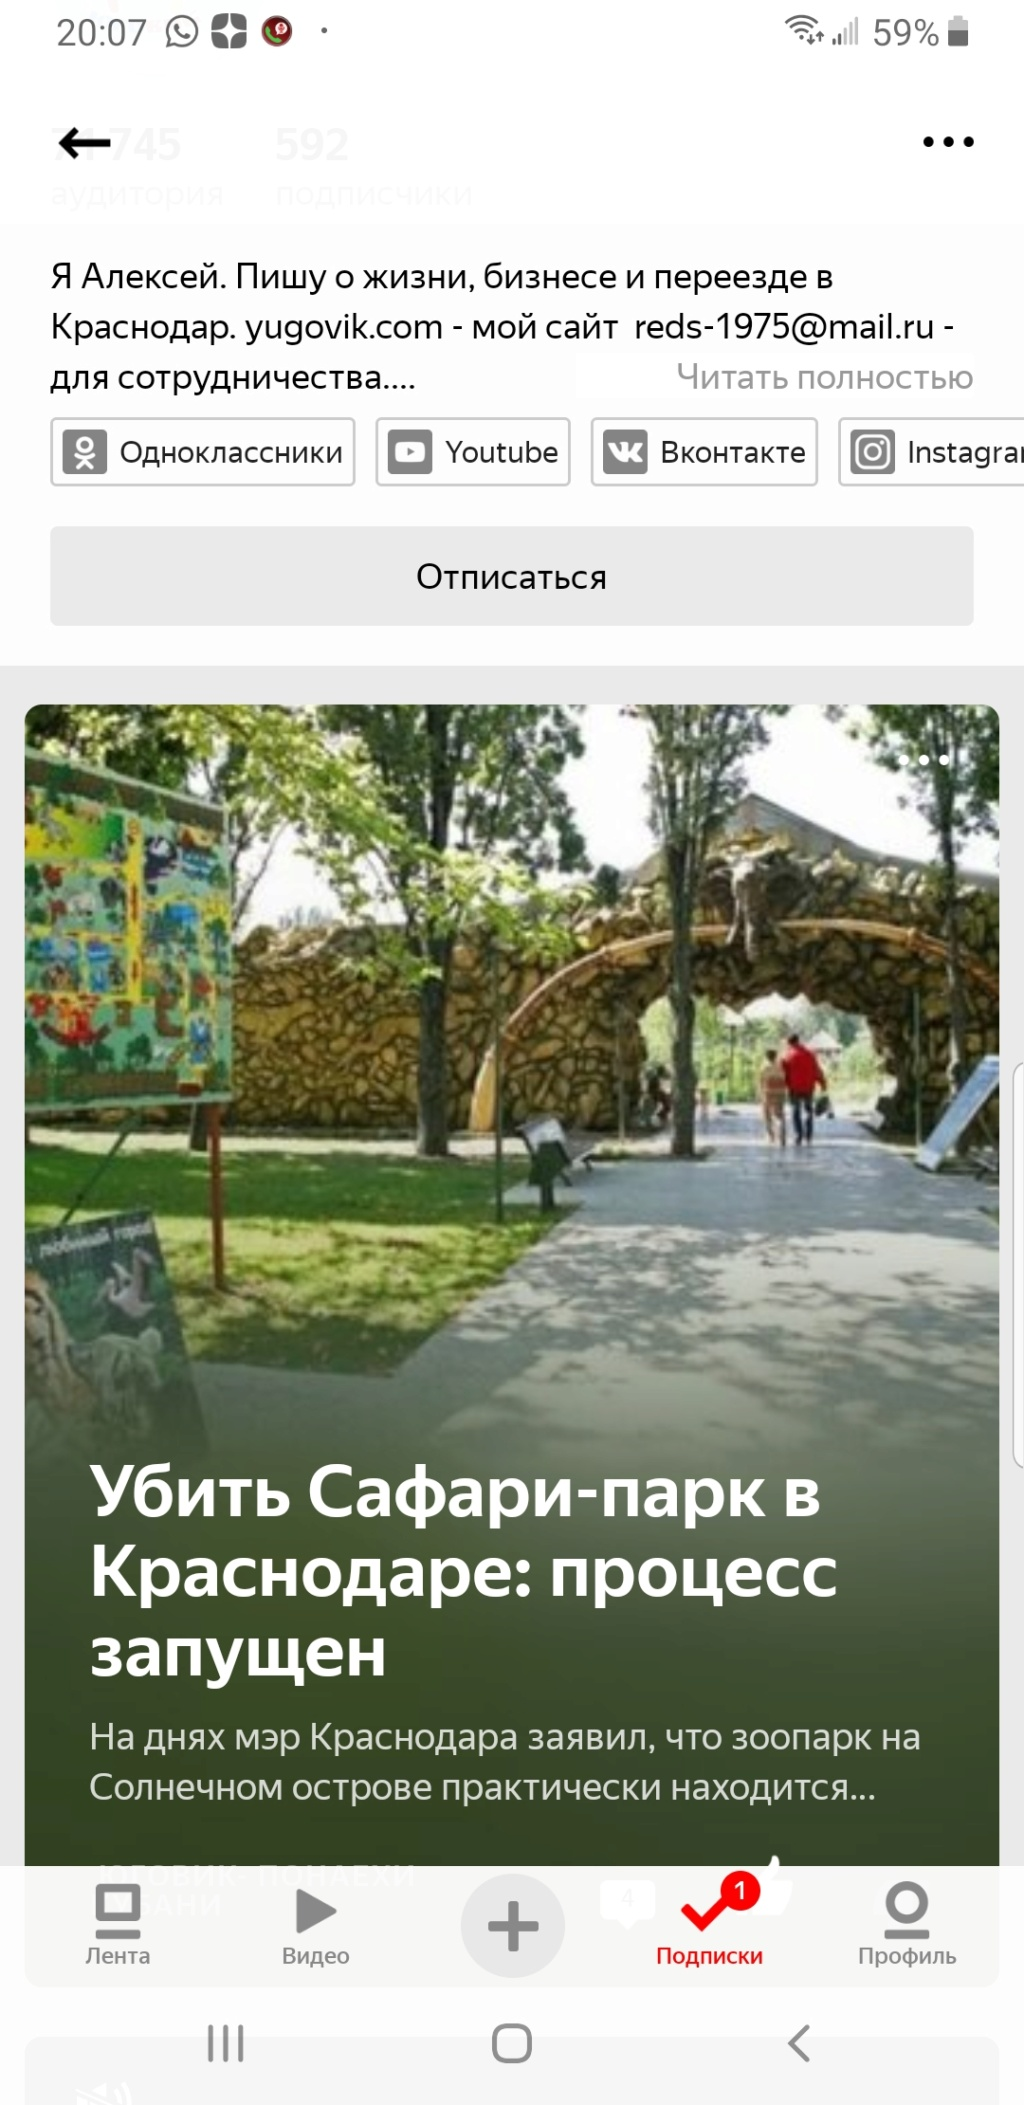 Юговик - Форум о переезде в Краснодар и край.. Будни... - Портал* Screen11